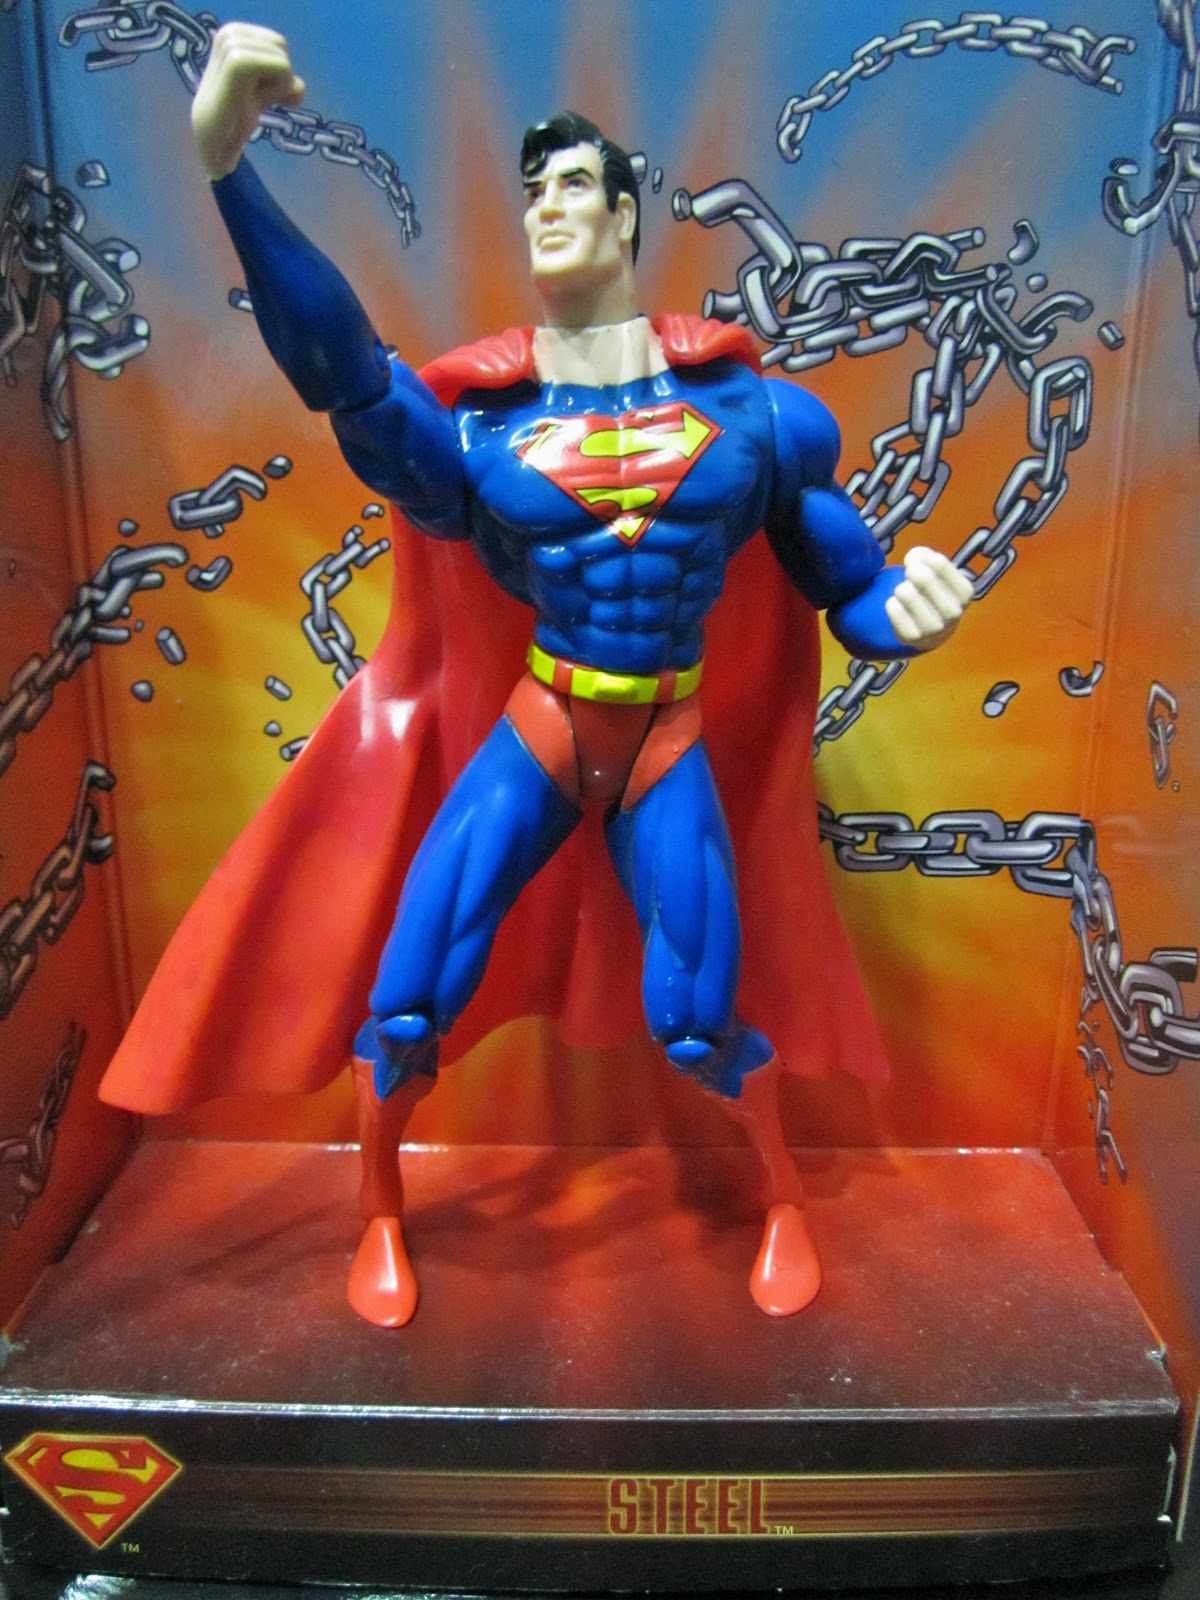 Hasbro Superman Superman Hasbro Superman Figurine Hasbro Figurine Figurine Superman Figurine Superman Hasbro reWBQdxCo